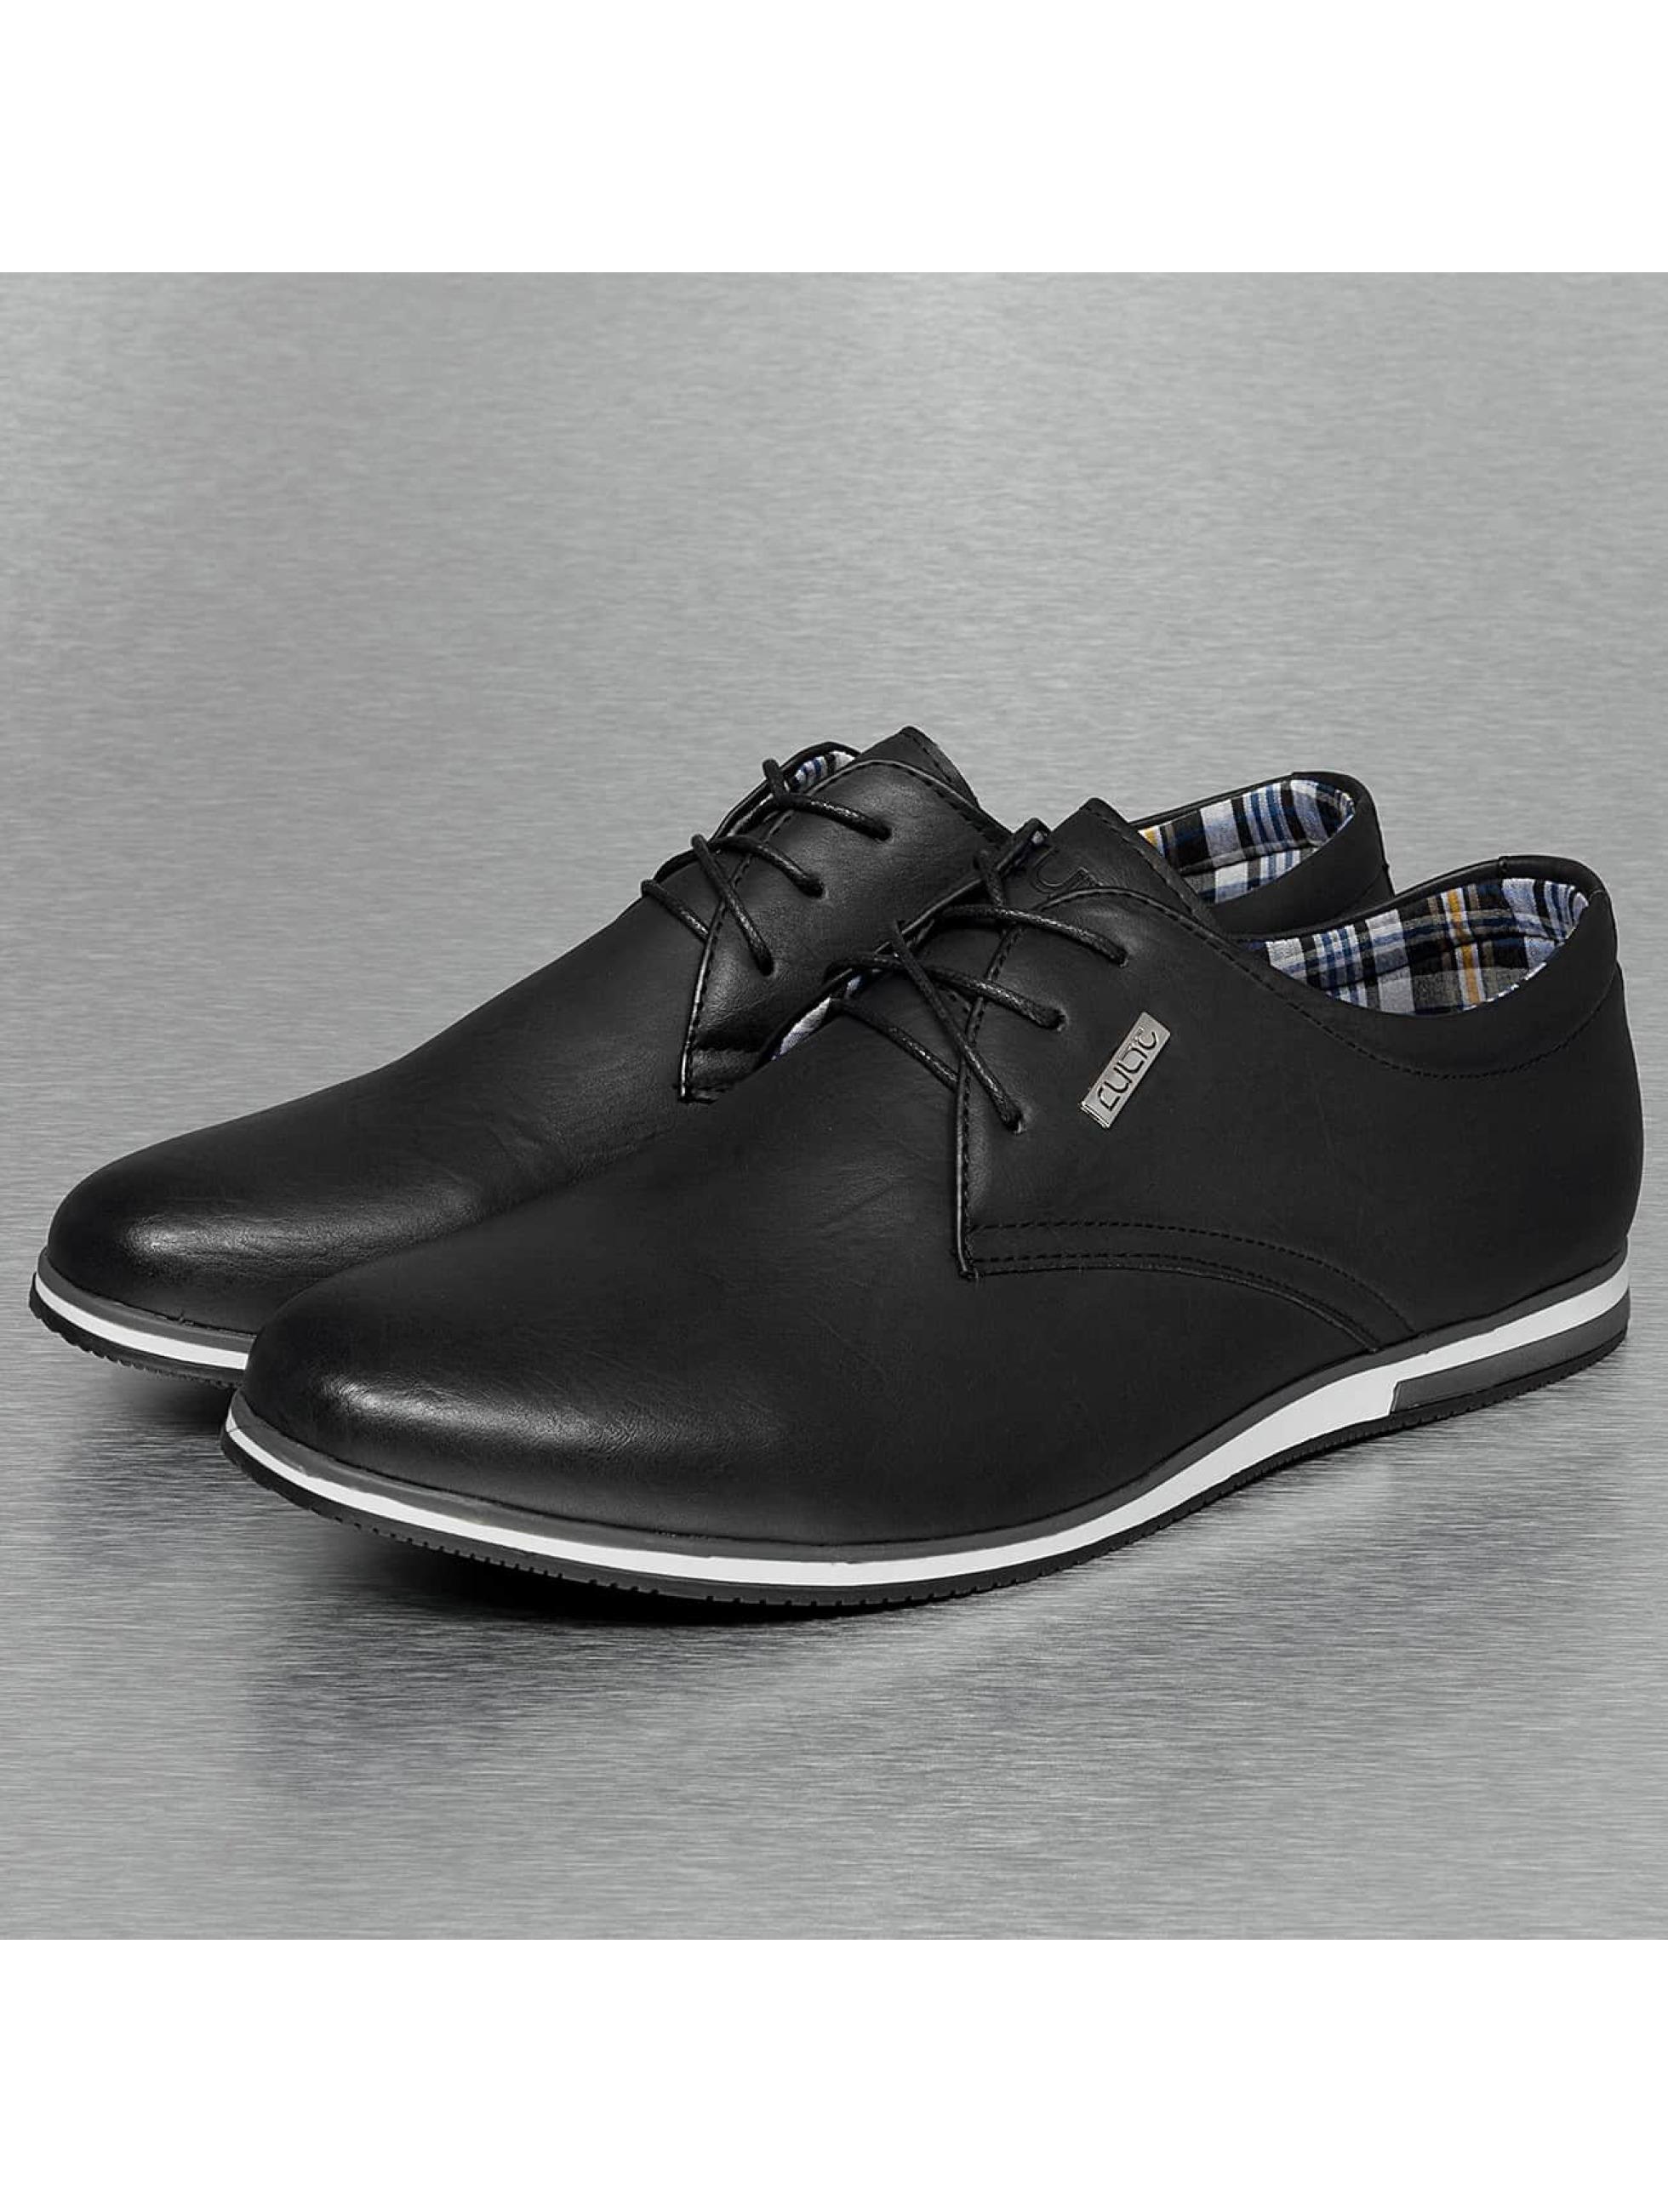 New York Style Sneaker Galway nero